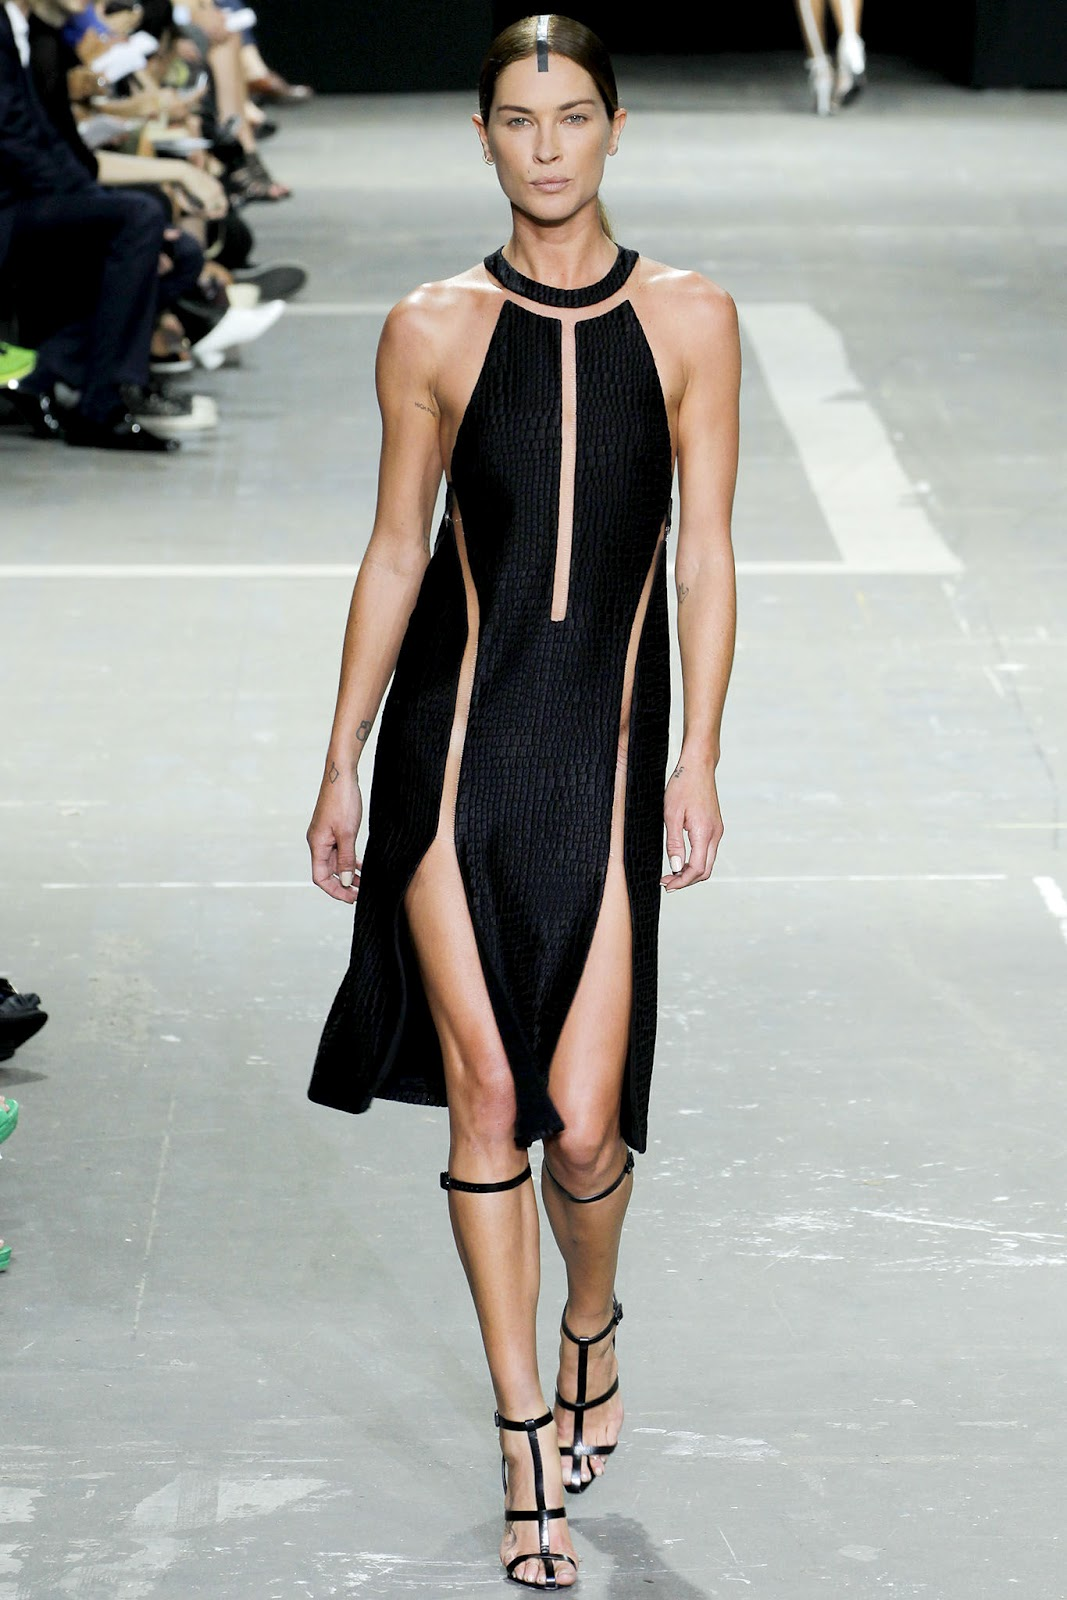 http://3.bp.blogspot.com/-ZU8Mw4WhiPY/UEzS6QC-U_I/AAAAAAAAn1I/vSGQsrAZ_rc/s1600/New-York-Fashion-Week-Alexander-Wang-Spring-2013-Collection-34.JPG